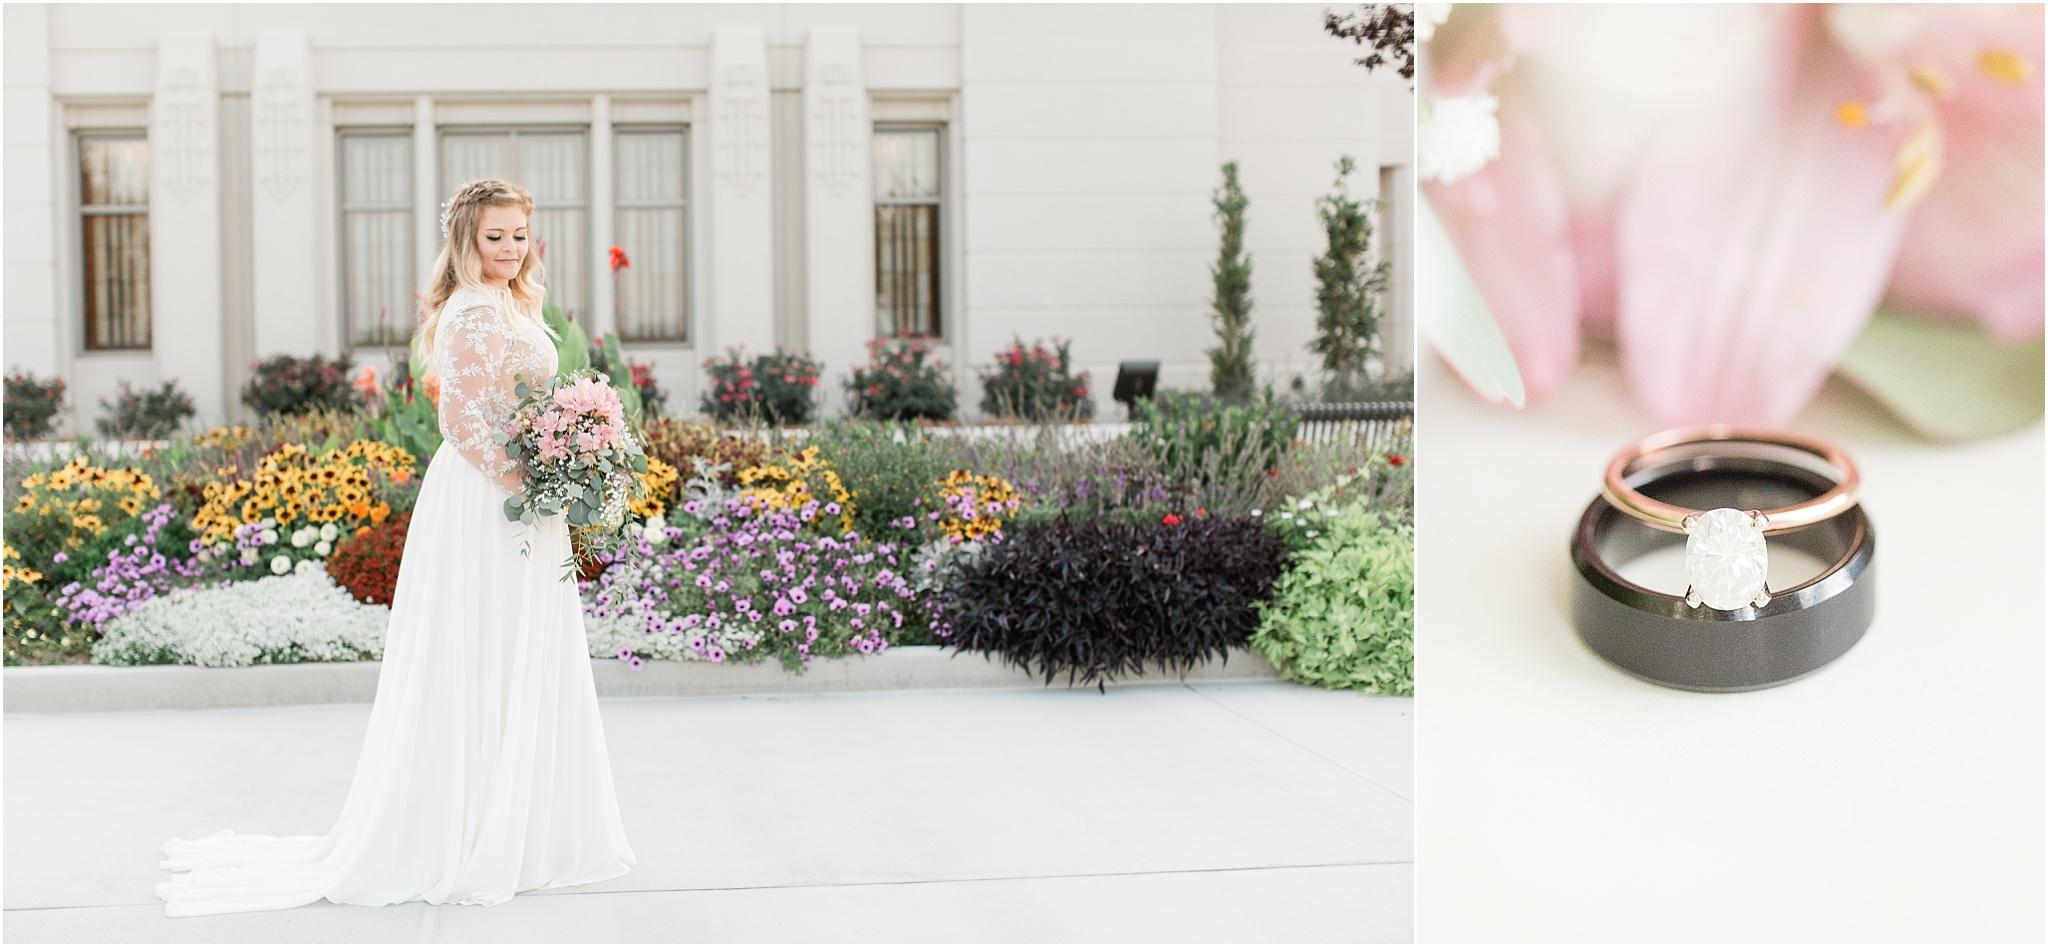 Wedding Photography_Meridian Idaho Temple_Boise Idaho_Nampa Idaho_Leah Southwick Photography_0007.jpg